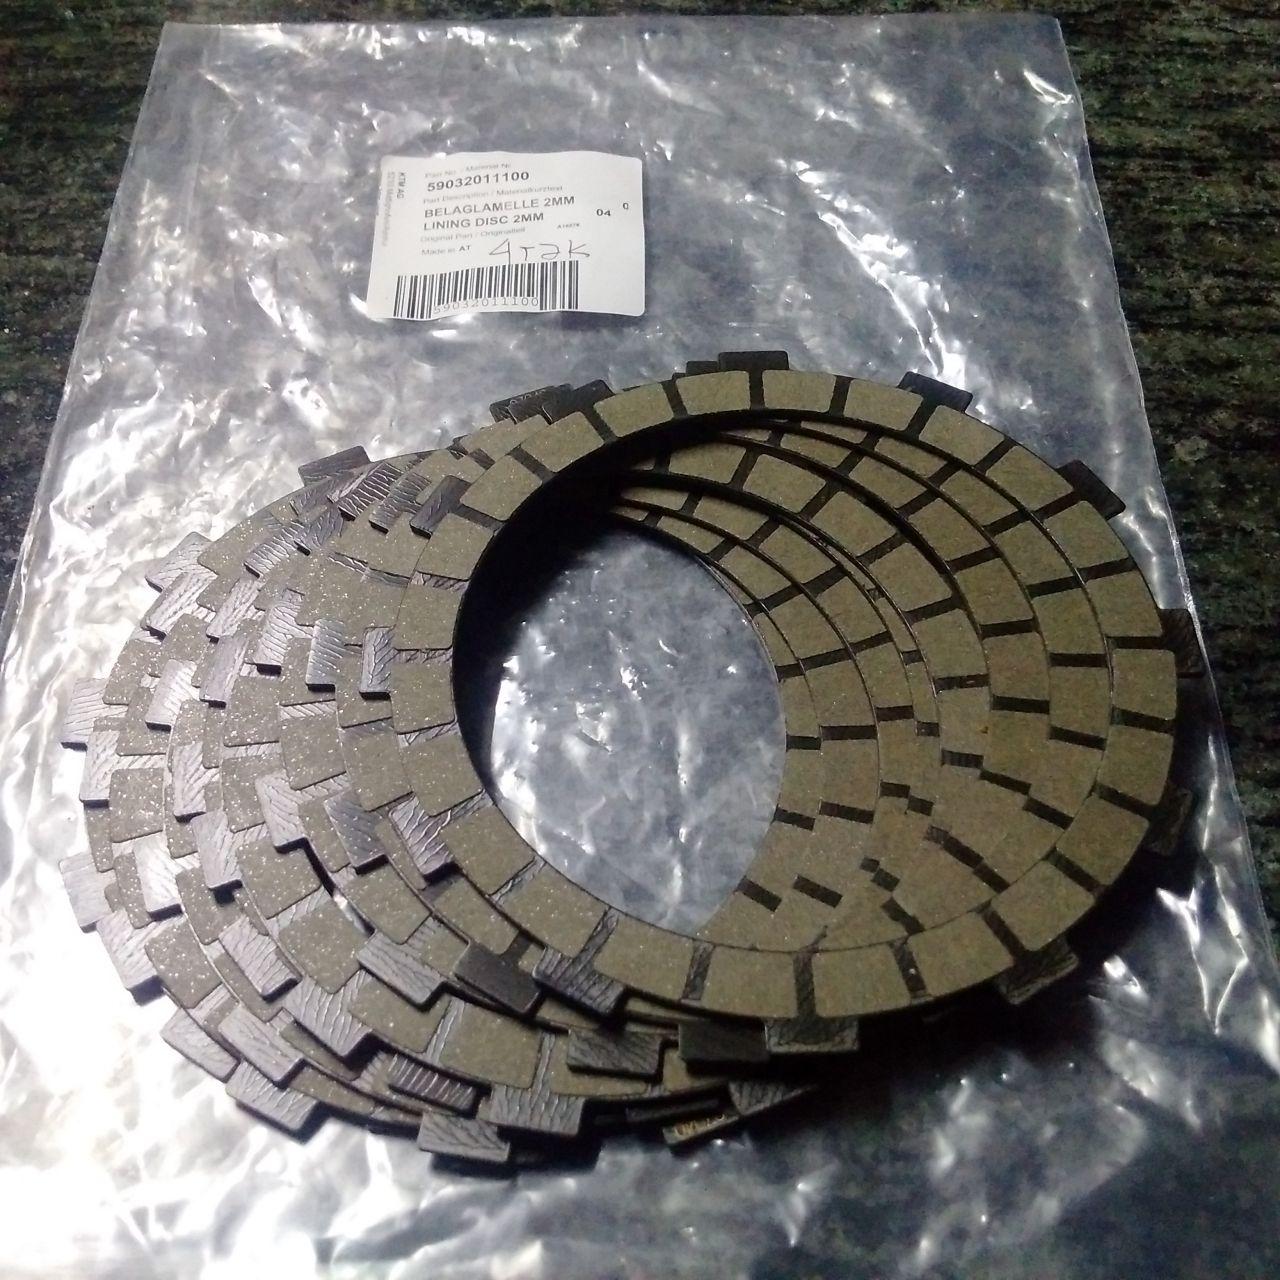 wpid wp 14824932964491 JualLining dISC 2mm ato kampas kopling kode parts 59032011100 untuk KTM 350cc original PARTS Rp.2,300,000